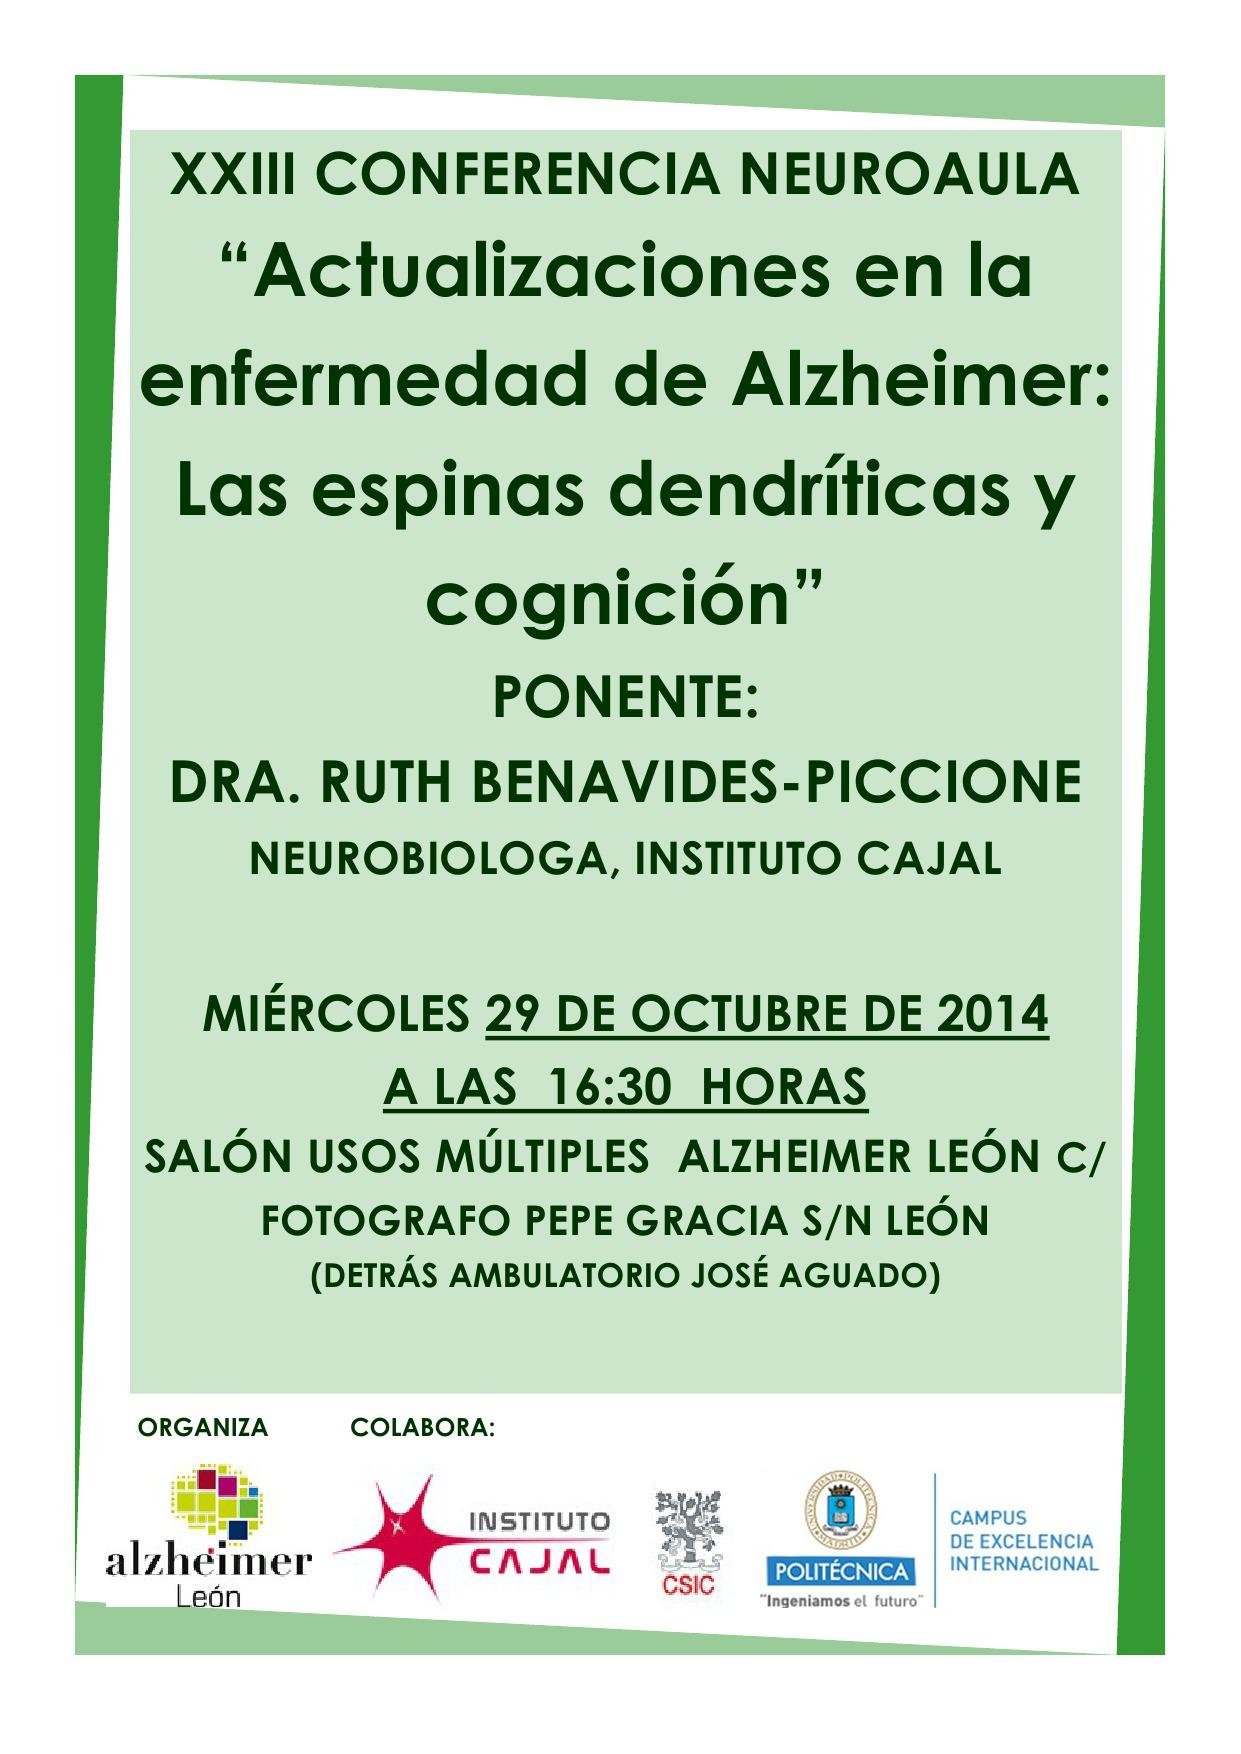 XXIII Conferencia Neuroaula